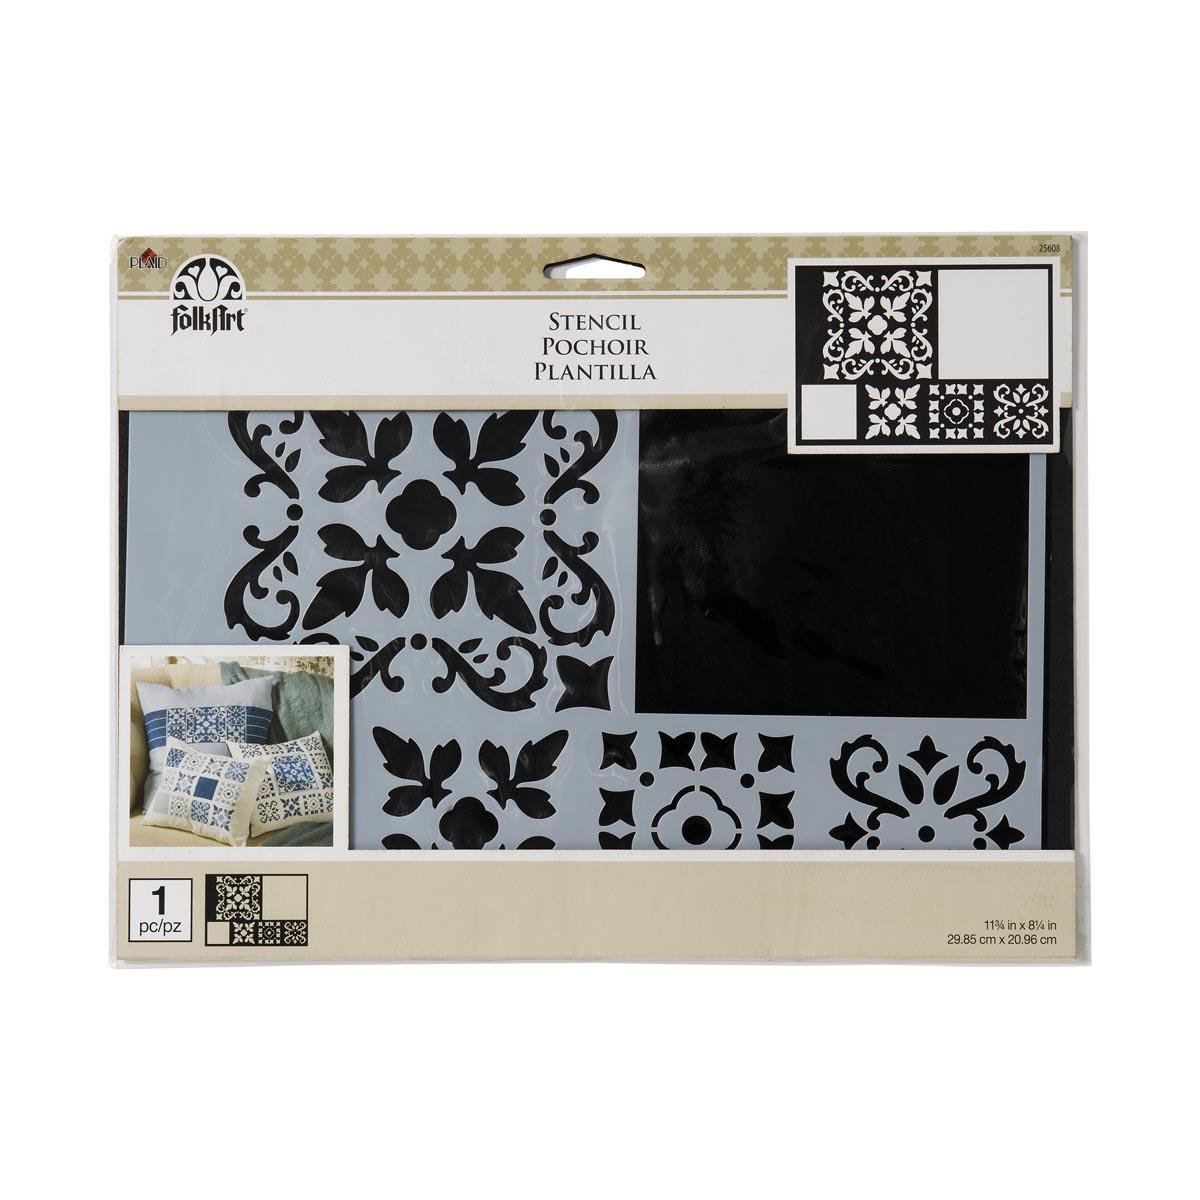 FolkArt ® Painting Stencils - Barcelona Tile